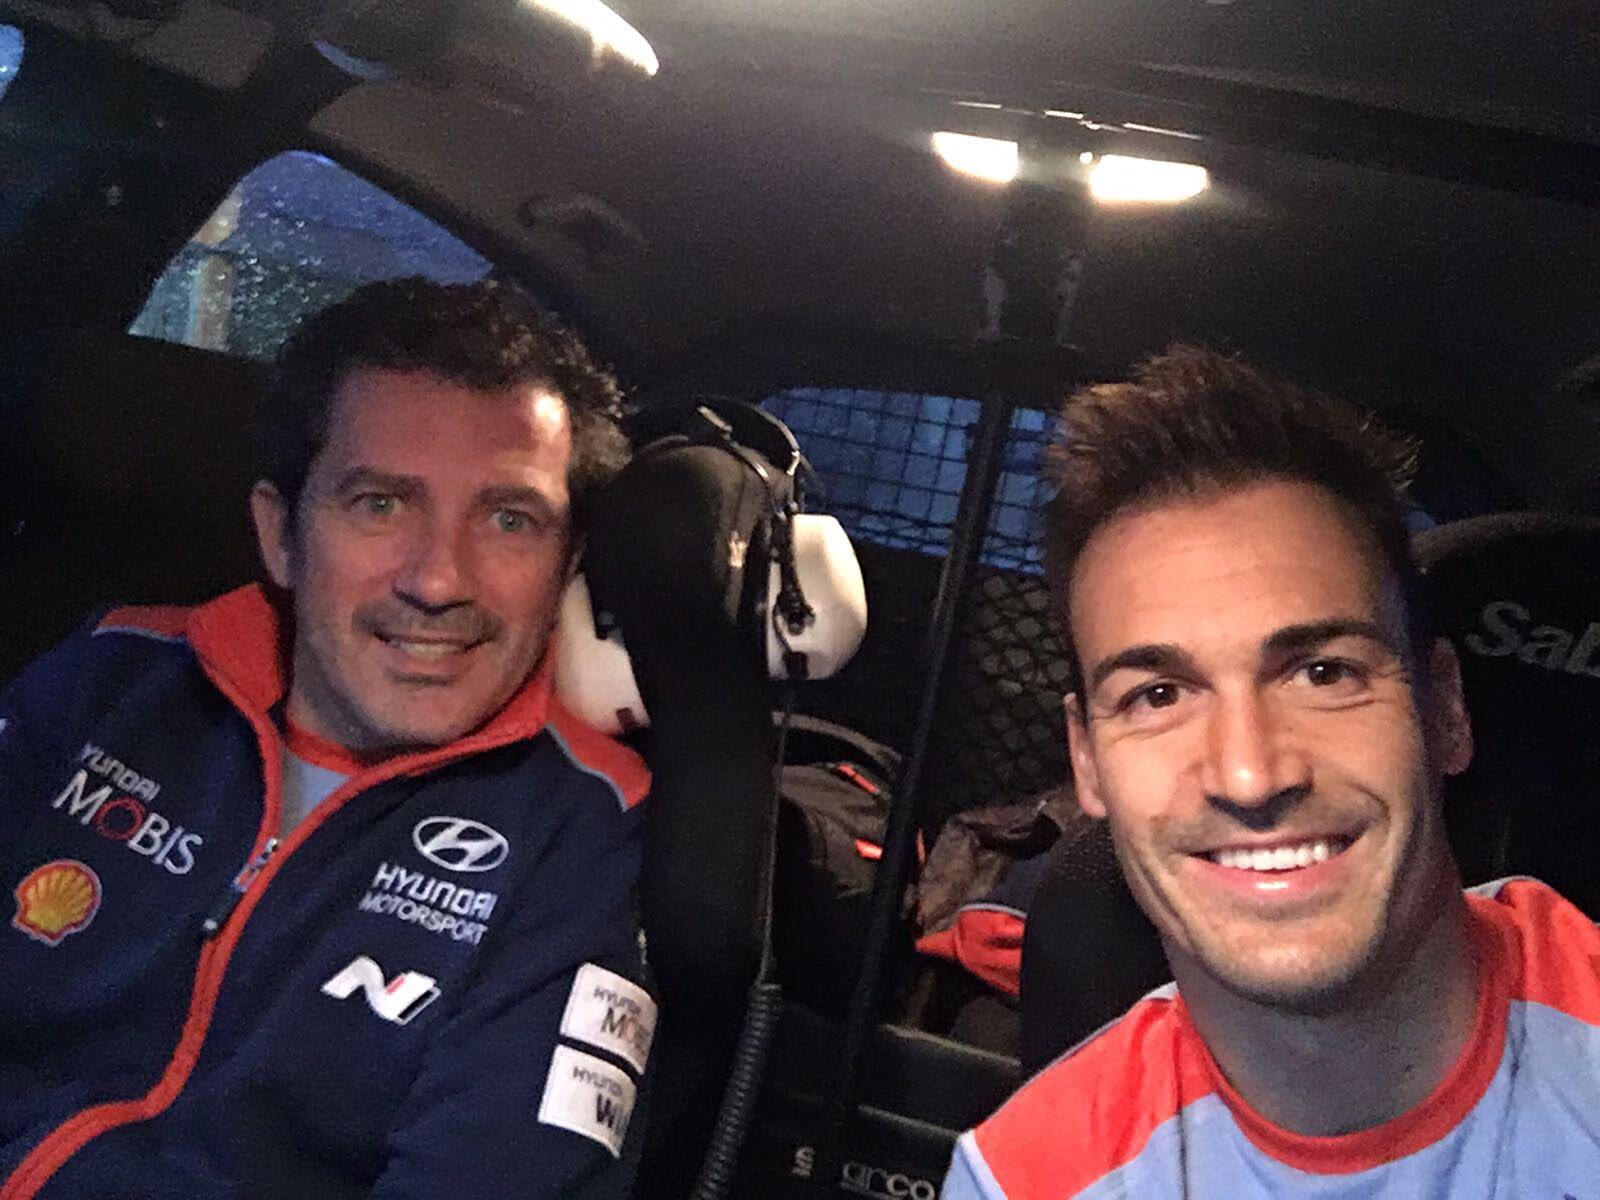 Rally Argentina 2017 C-QN04cXYAEVUPM